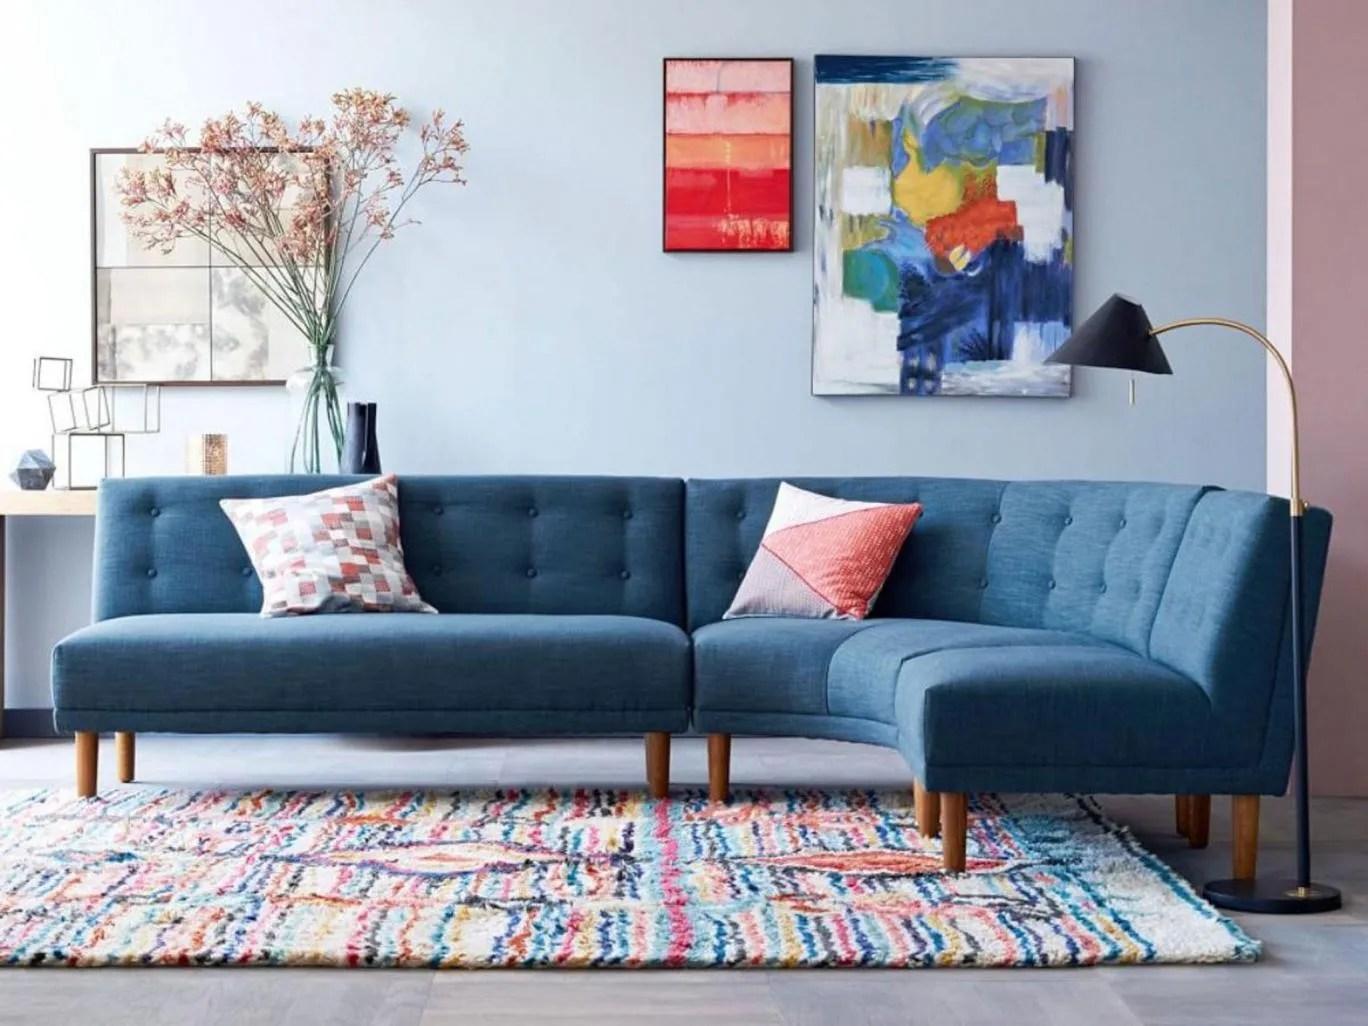 barcelona sofa uk designer beds singapore plush bed baci living room